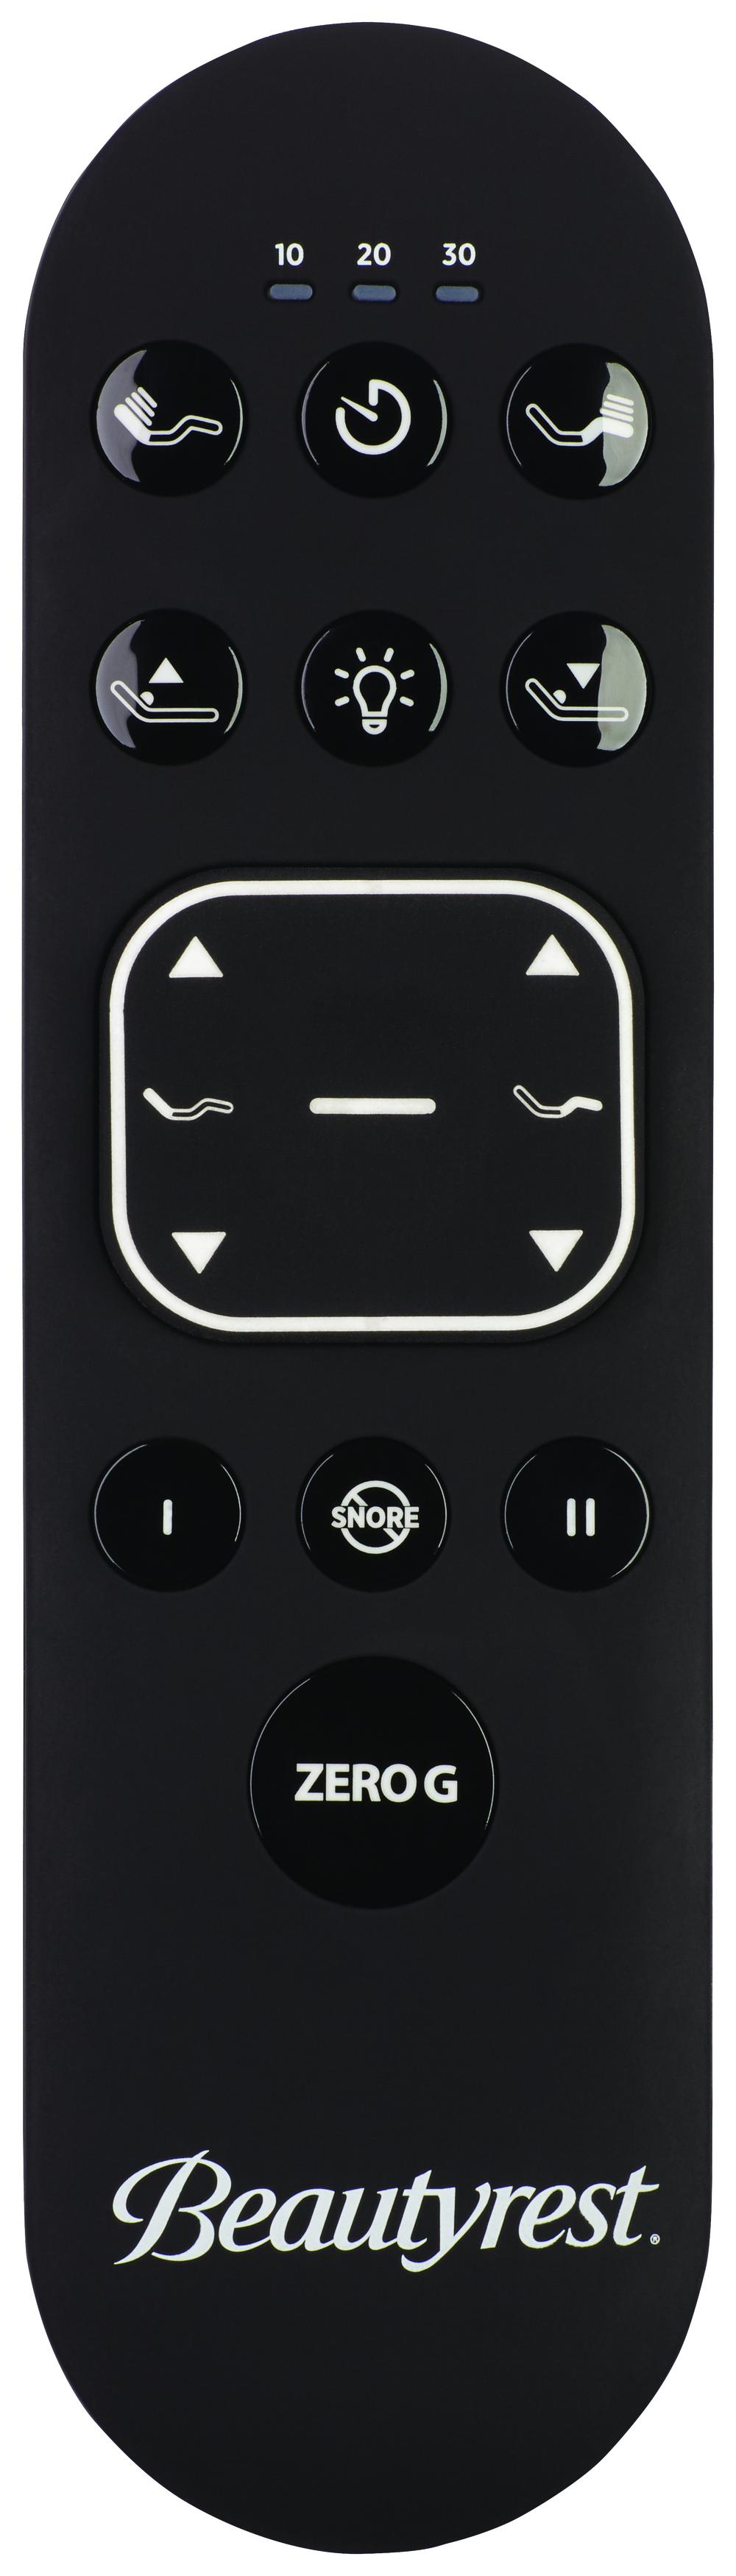 SIMMONS BEDDING COMPANY - BR Black C Class Plush PT Mattress with BR Black Luxury Motion Base